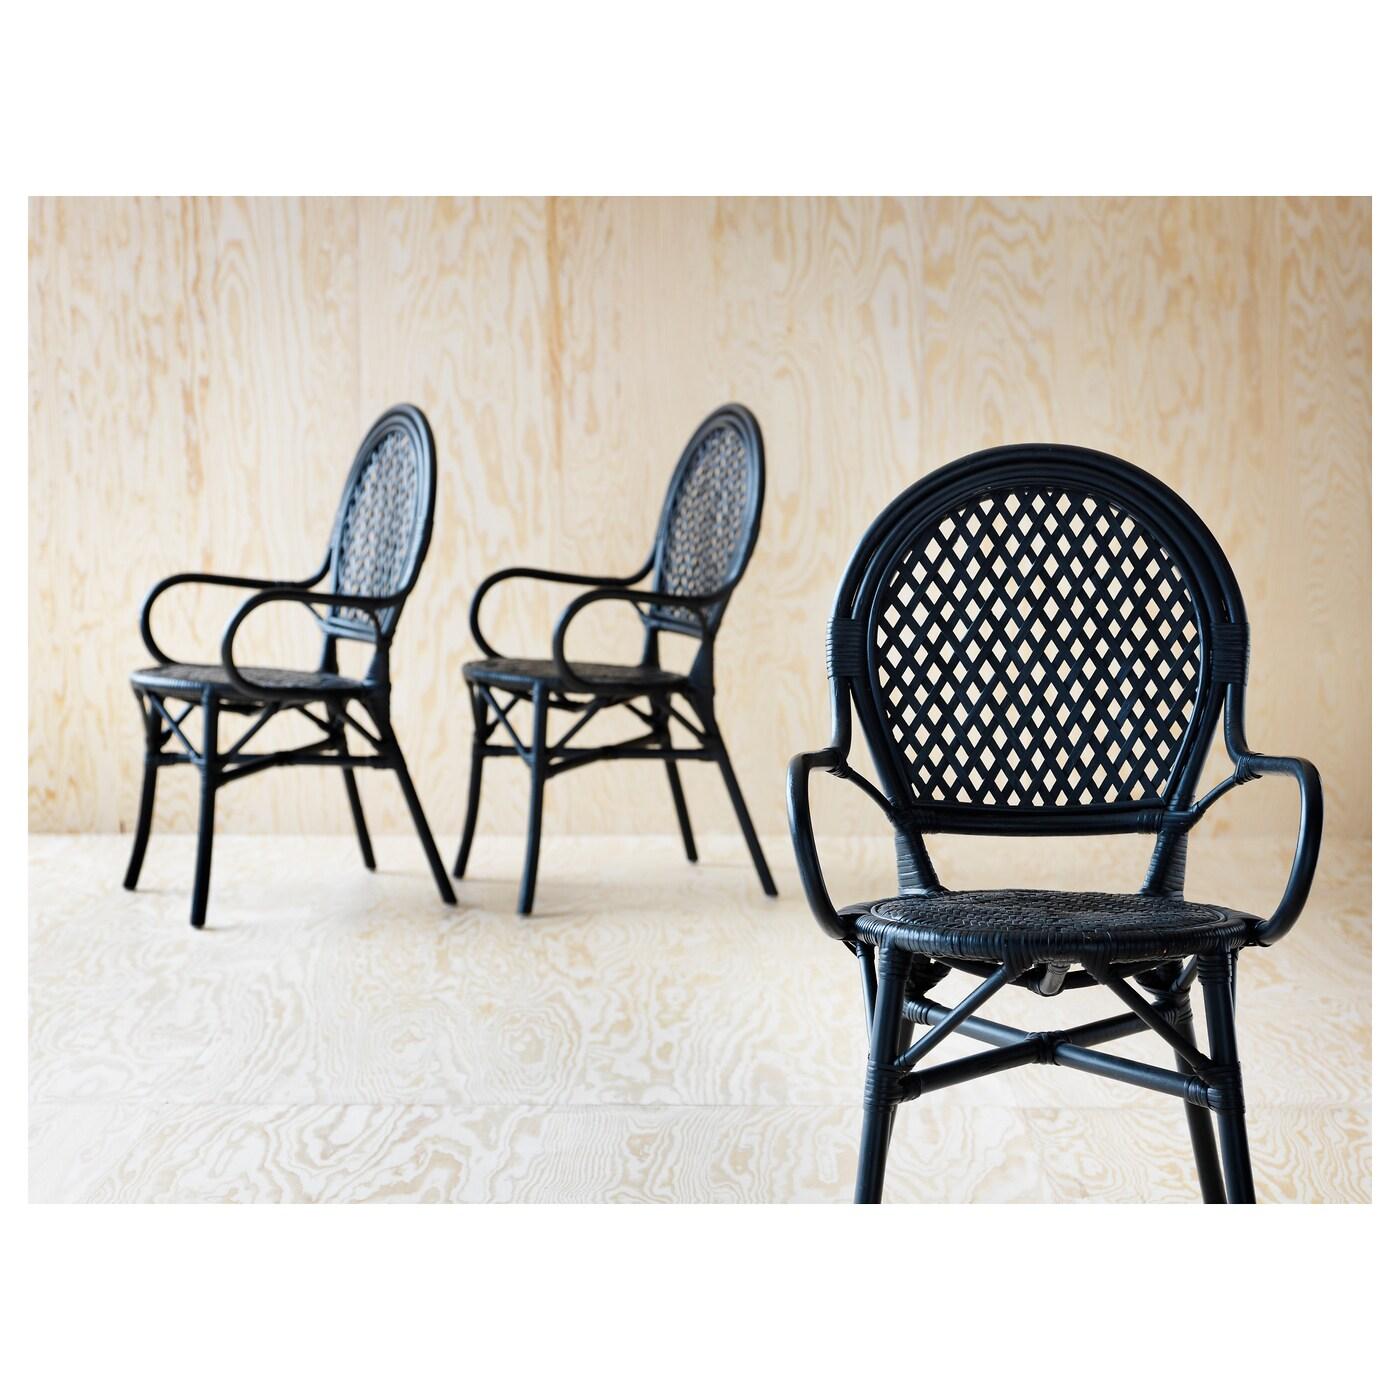 lmsta chair rattan black ikea. Black Bedroom Furniture Sets. Home Design Ideas